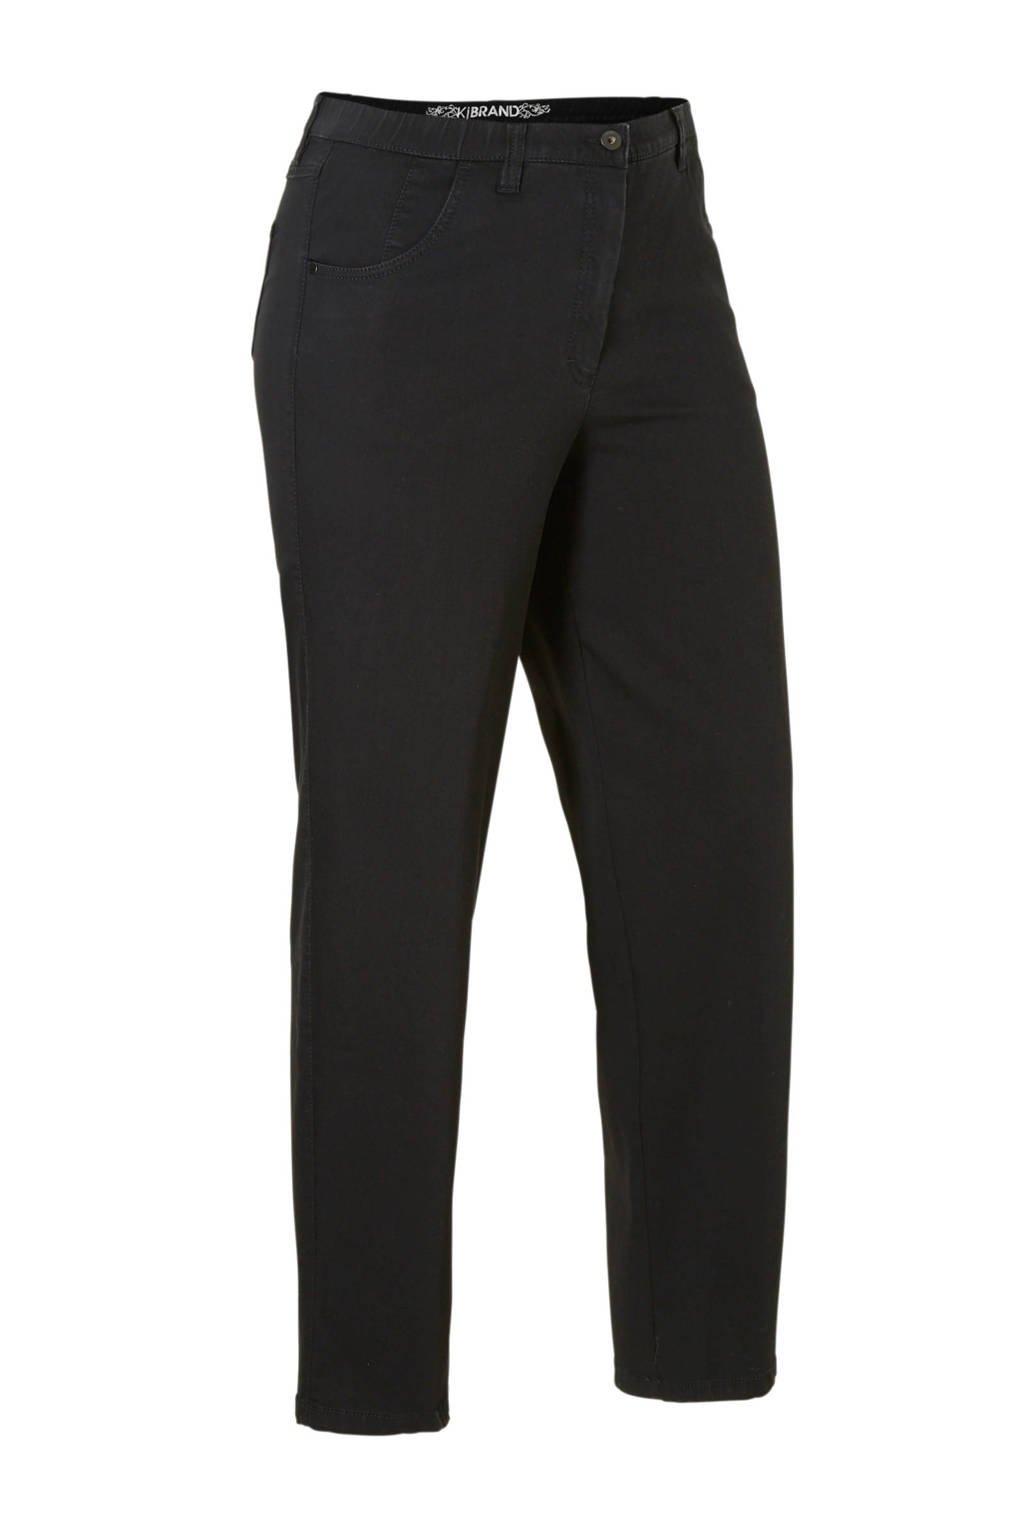 KjBRAND loose fit jeans met wol zwart, Zwart